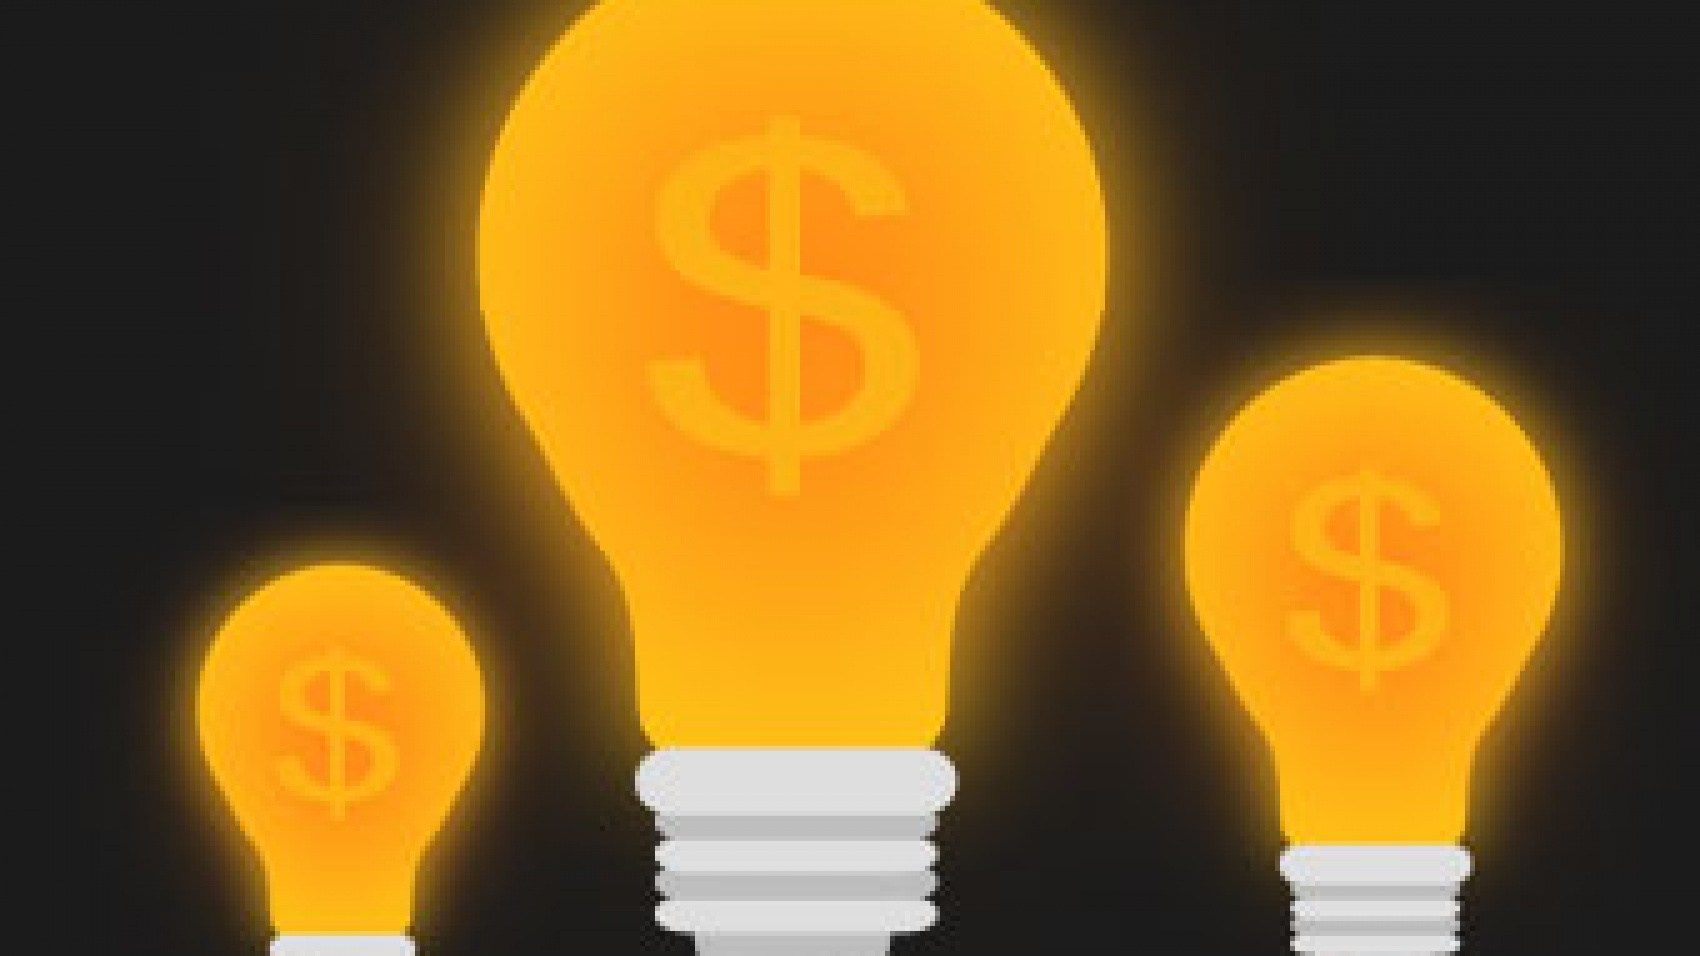 Three Warm Bulbs with Dollar Signs